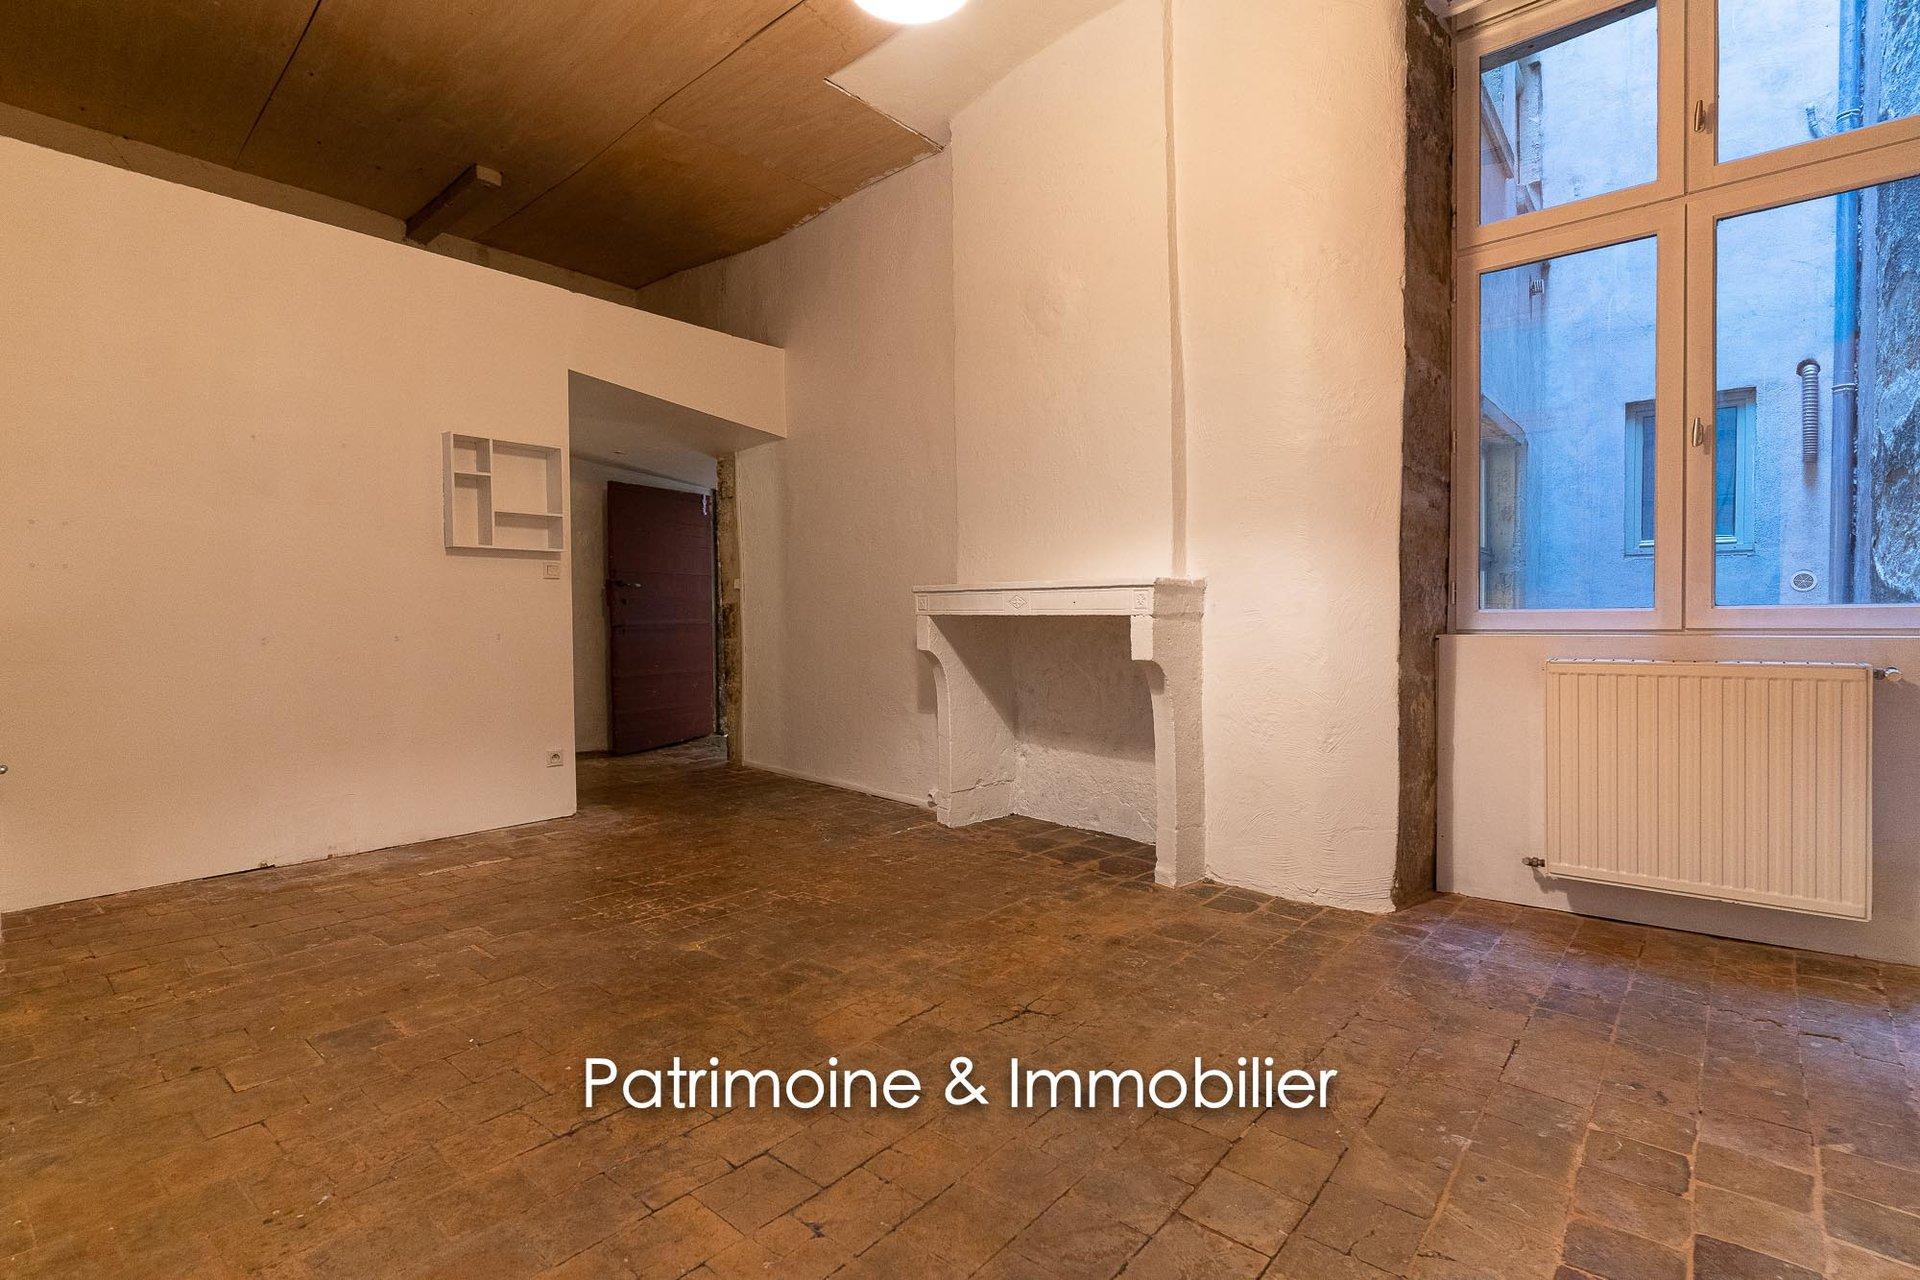 Sale Apartment - Lyon 5ème Vieux Lyon